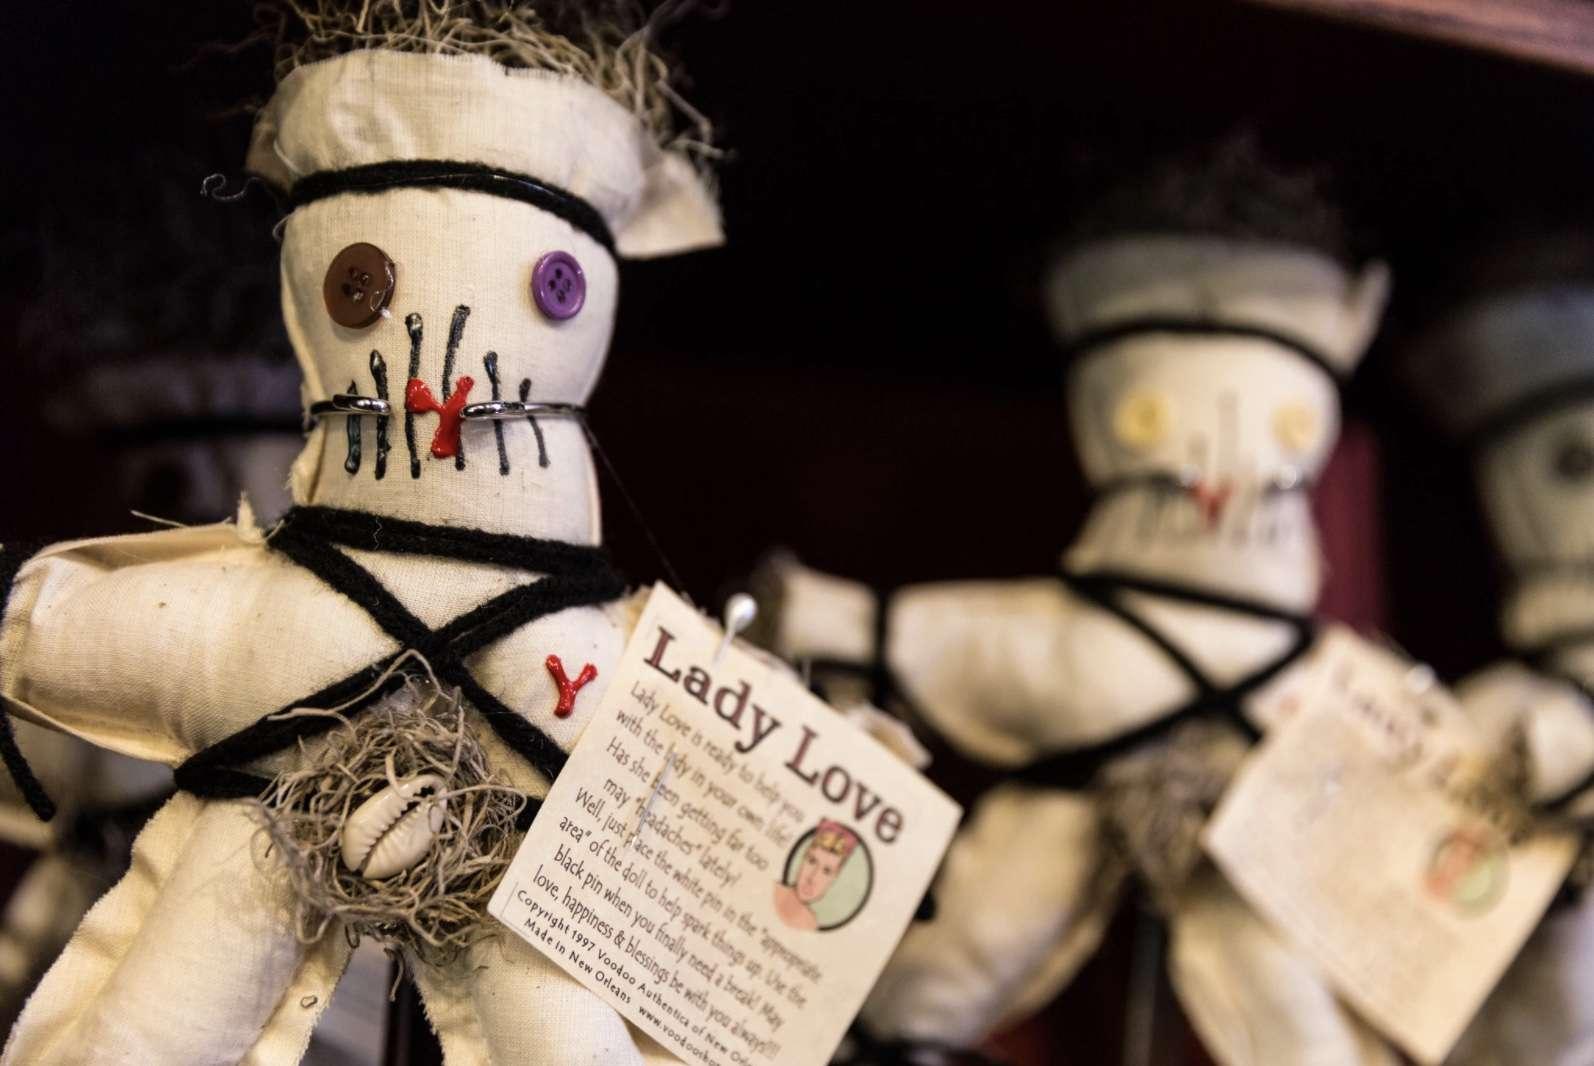 Love spell voodoo dolls in New Orleans